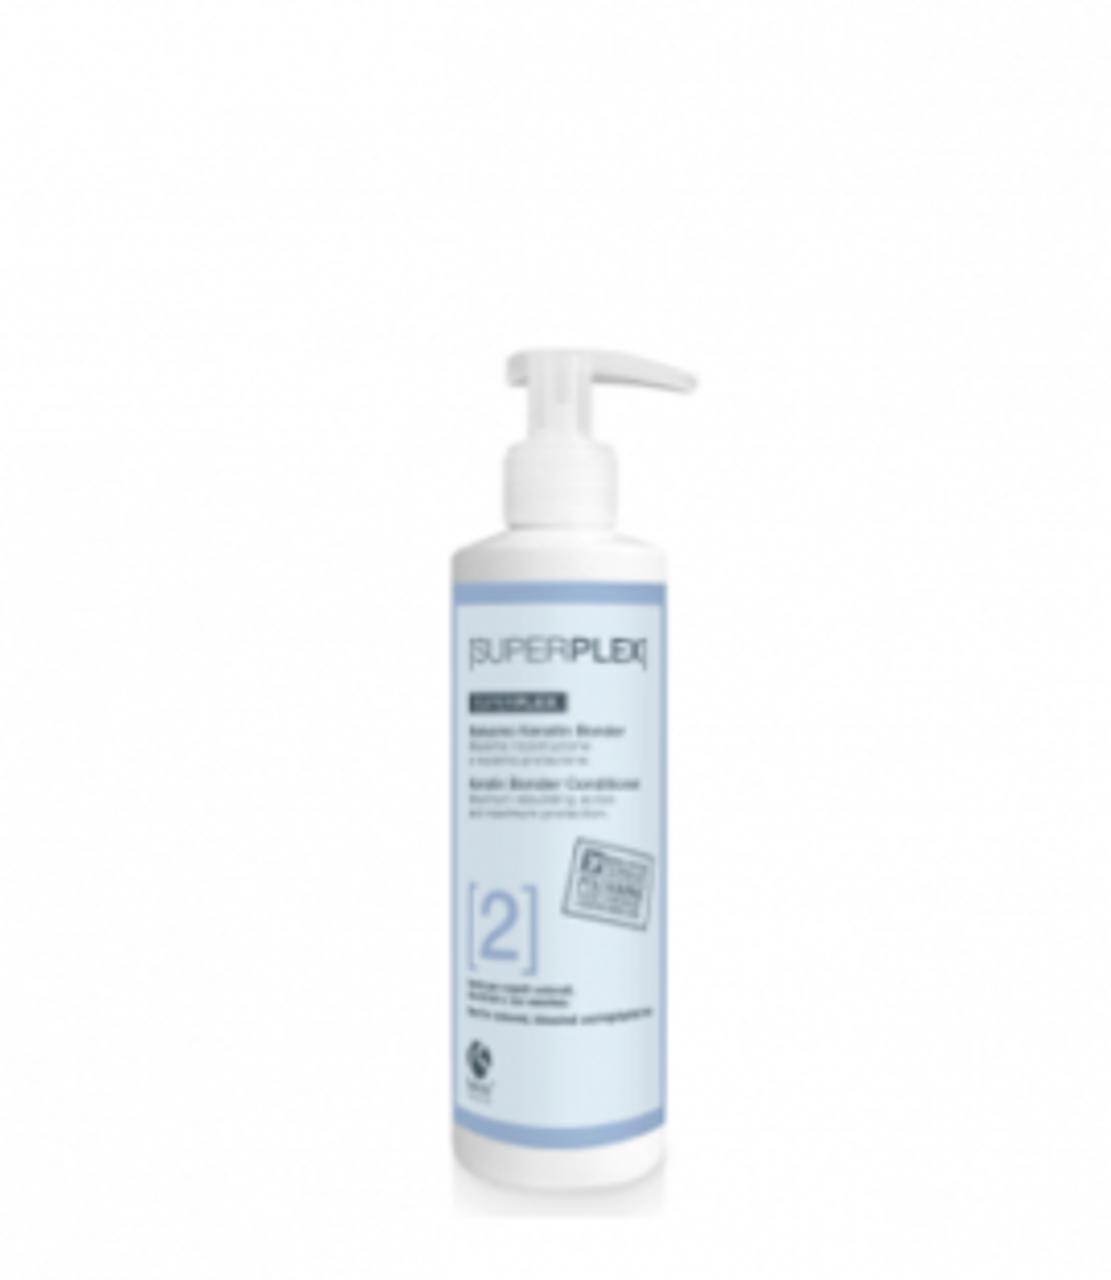 Barex Italiana Superplex Keratin Bonder Conditioner, 8.5 fl oz (250 ml)